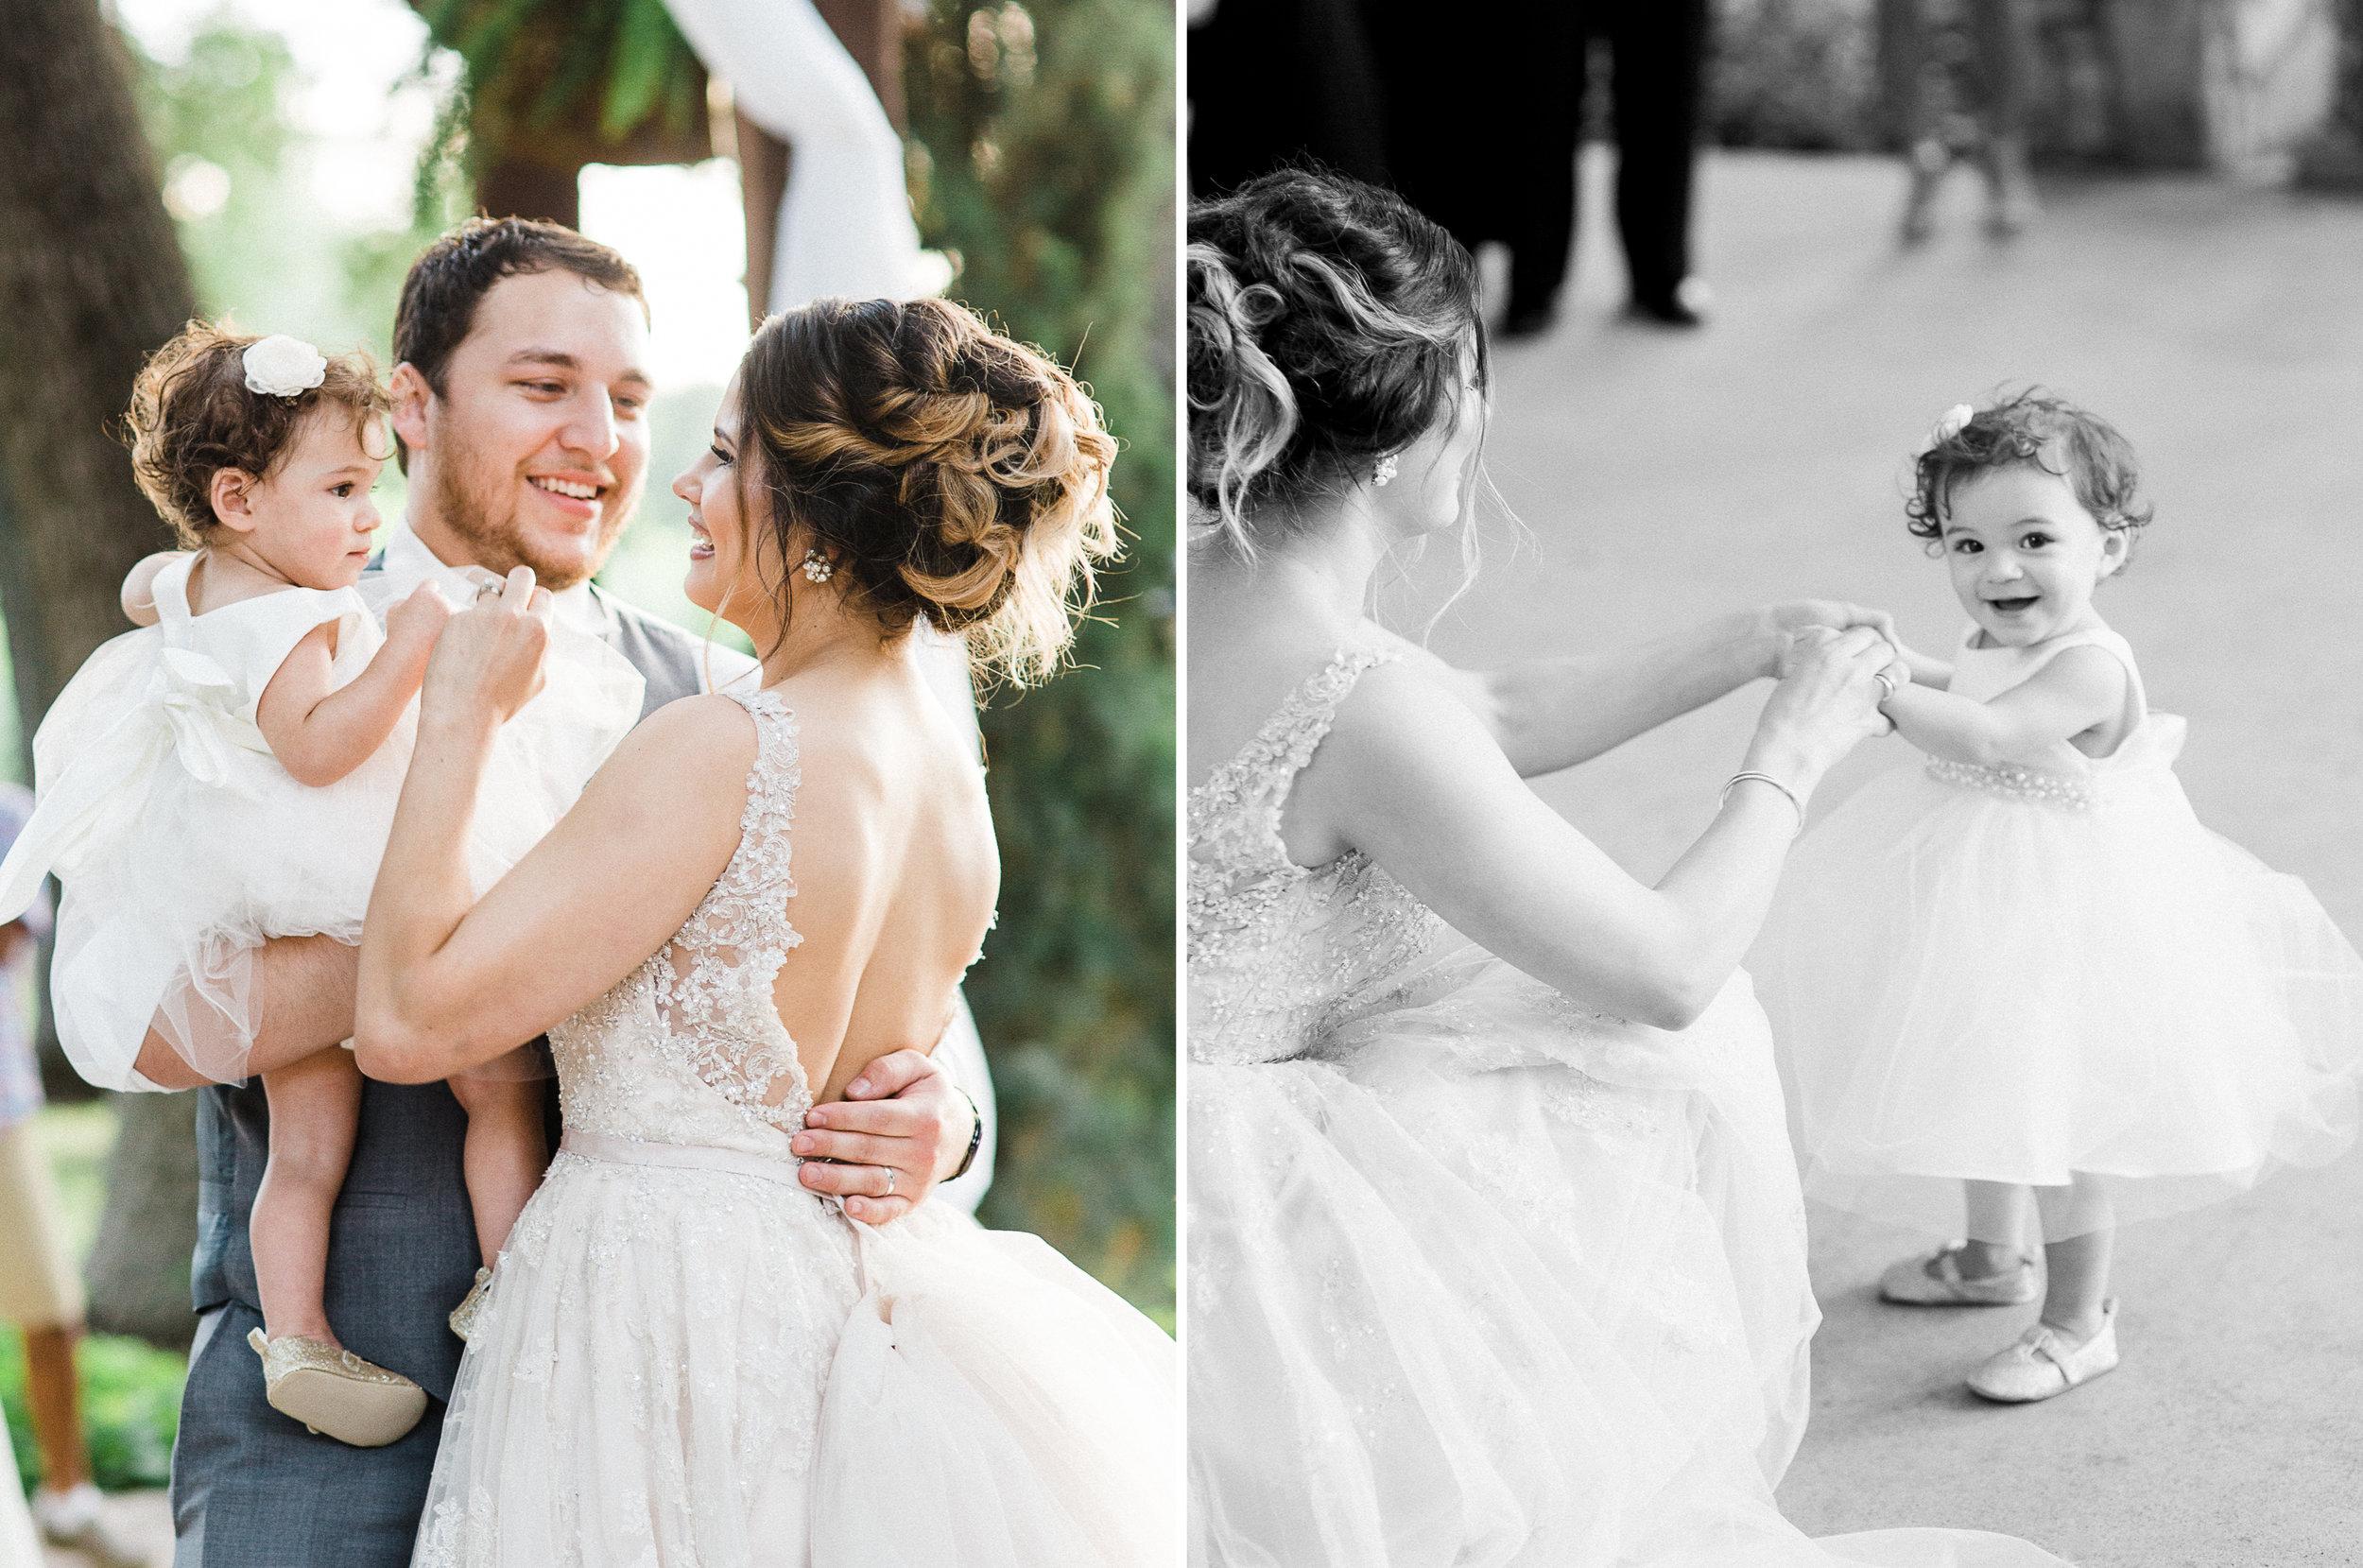 Elegant Spring Vineyard Wedding | Film Wedding Photographer | Austin Wedding Photographer | The Sweetest Mother Son Wedding Dance | Britni Dean Photography // britnidean.com